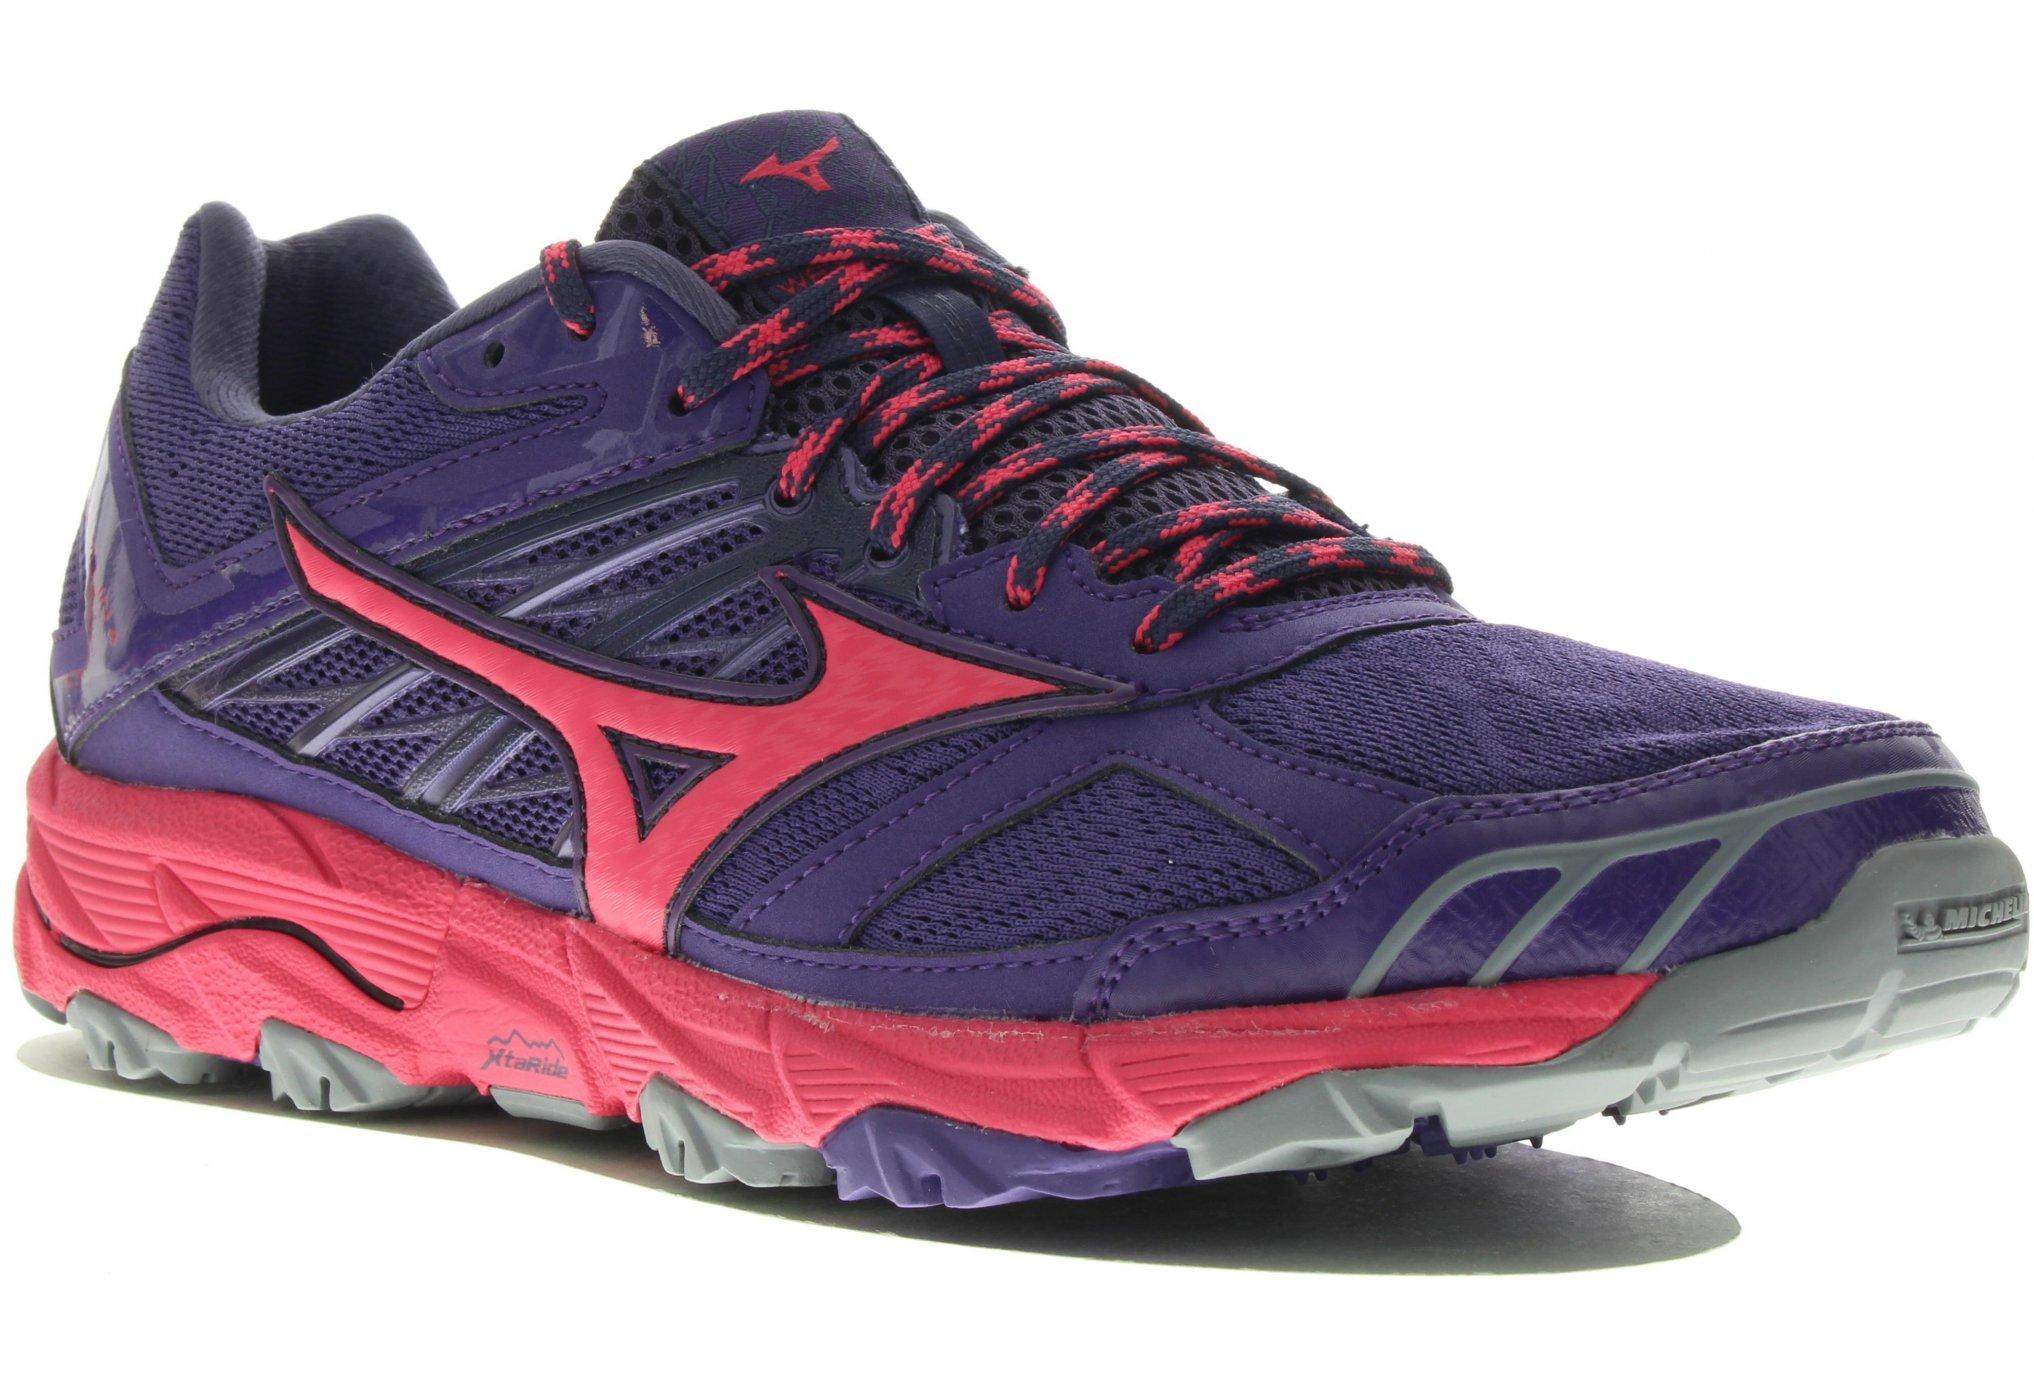 Mizuno Wave Mujin 4 Chaussures running femme